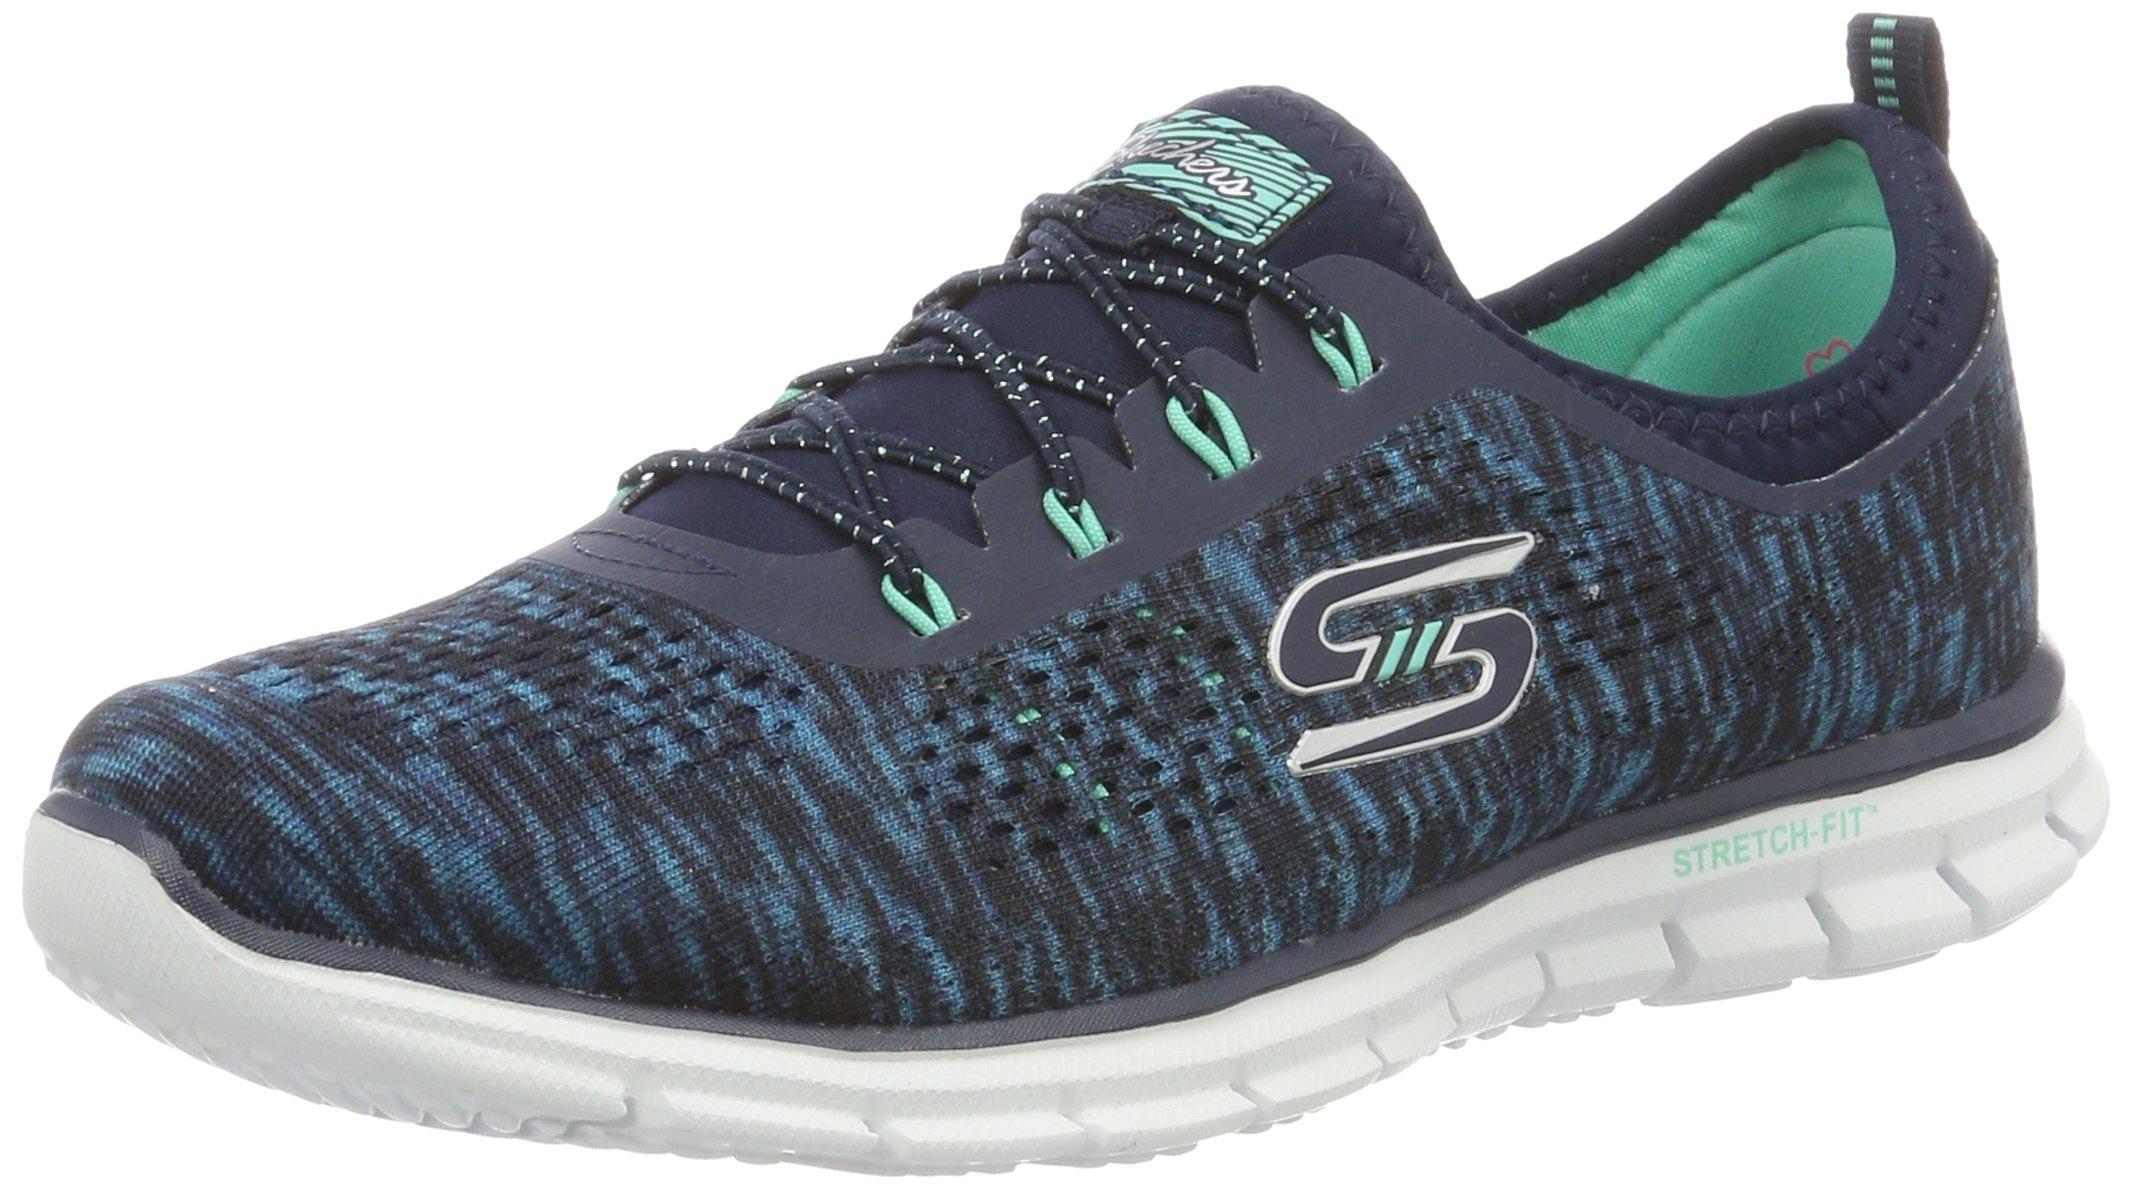 Skechers Glider Deep Space Womens Sneakers Navy/Green 8.5